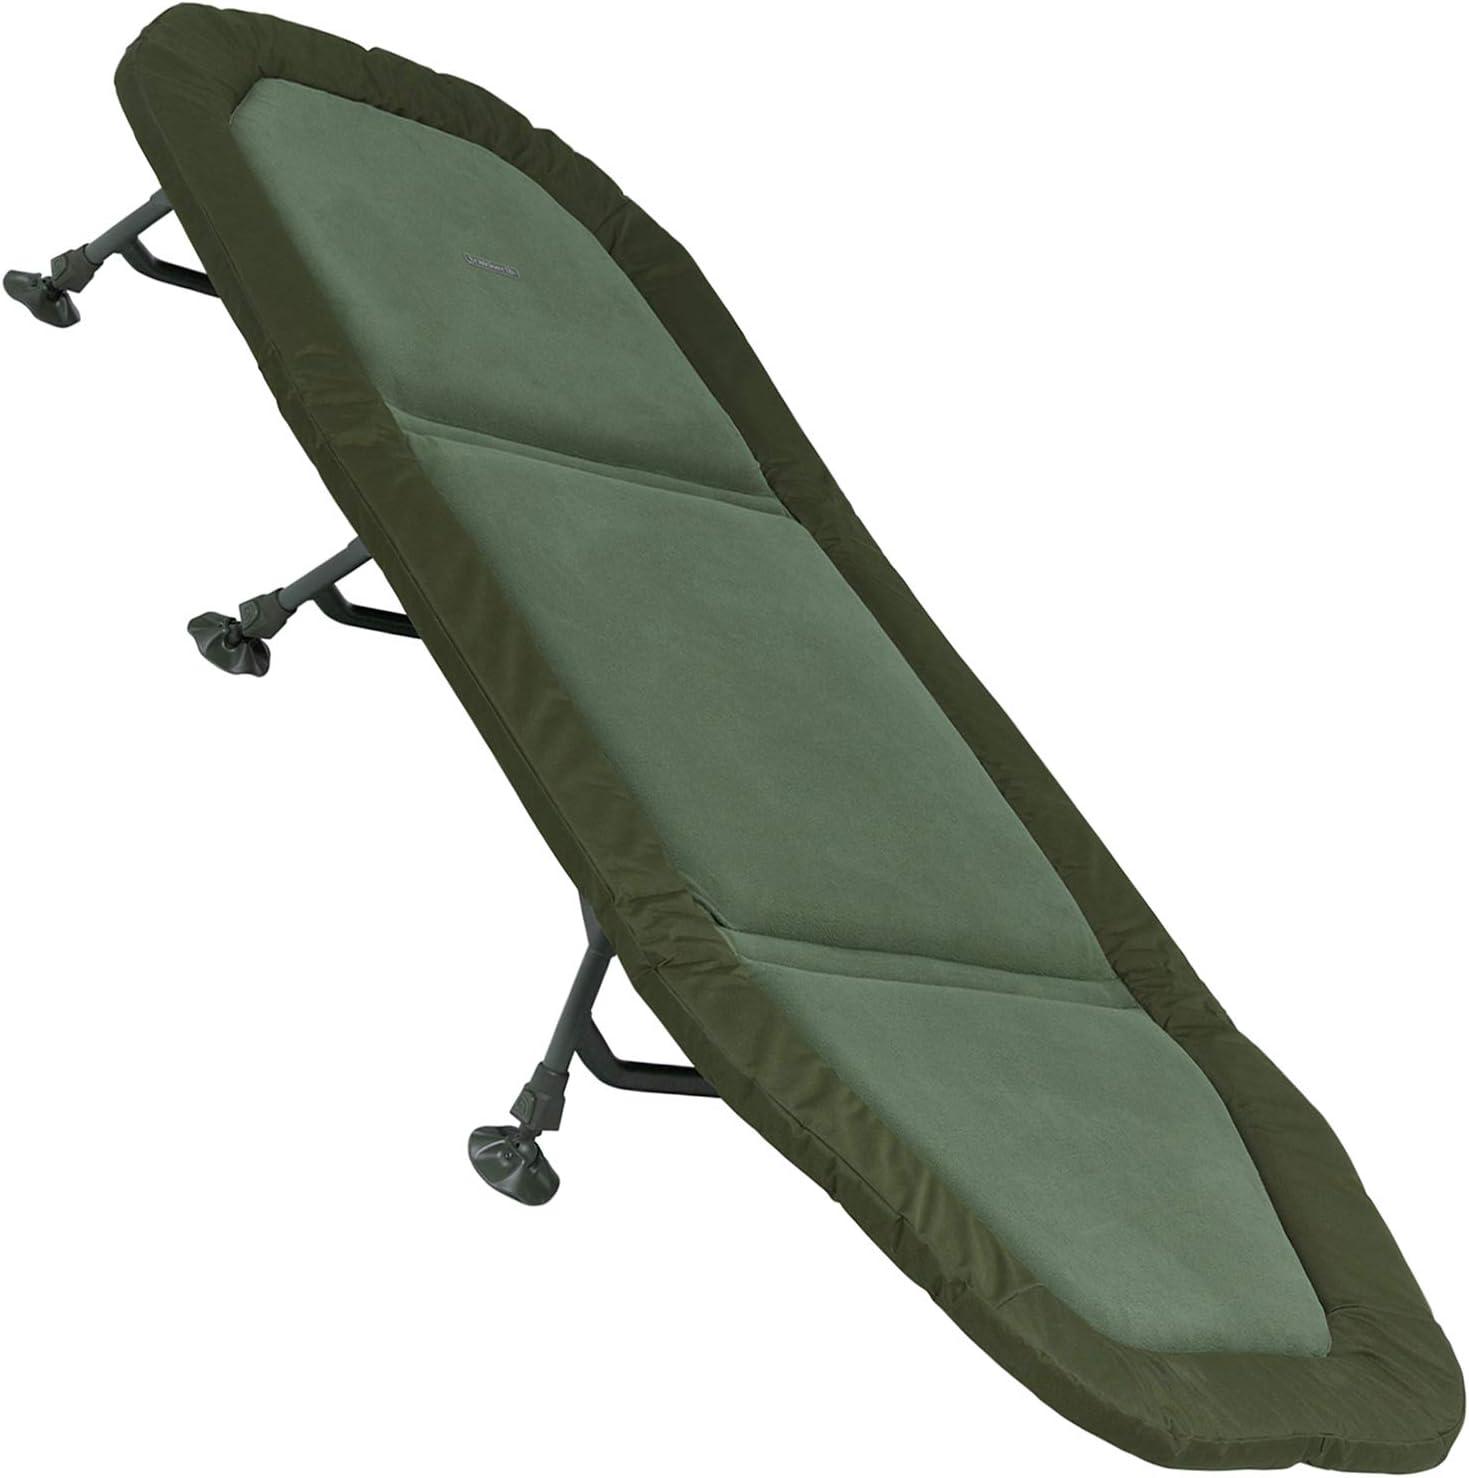 Trakker Bed-Chair Levelite Lumbar: Amazon.es: Deportes y aire libre